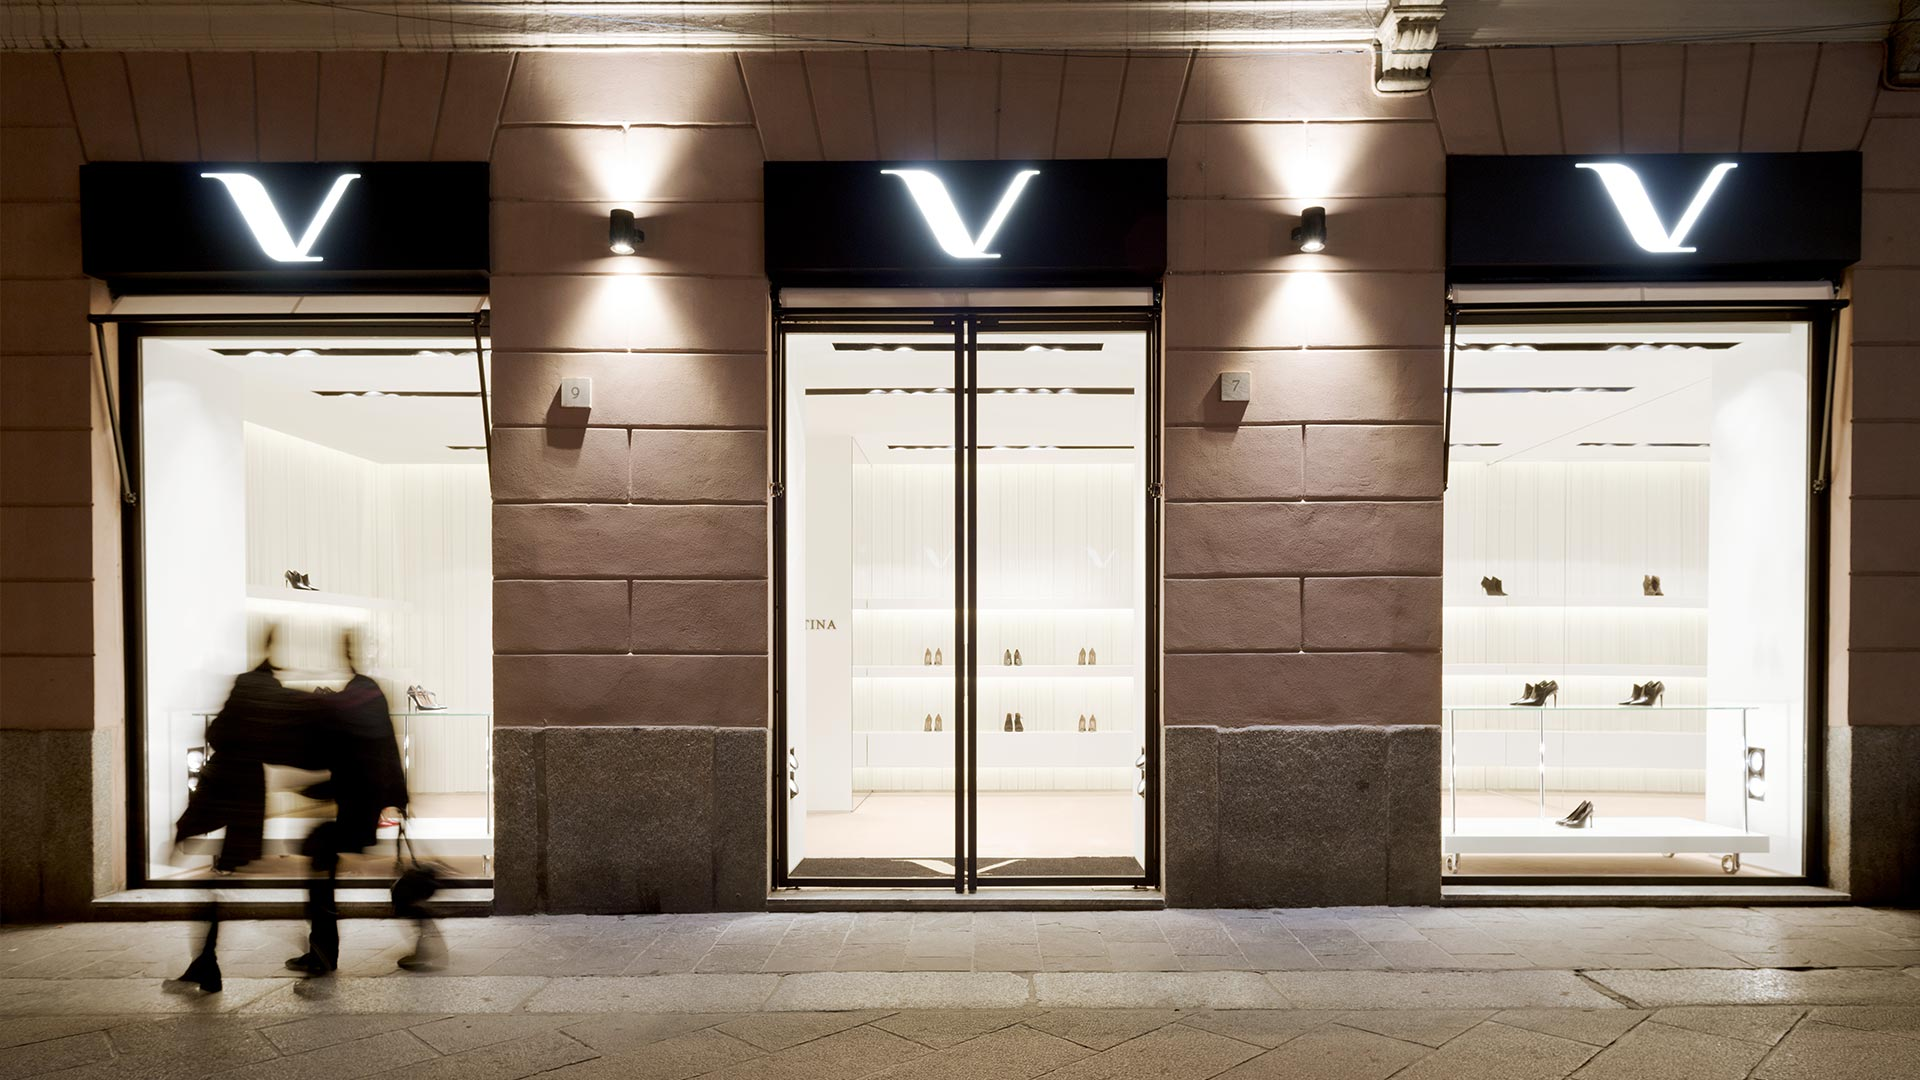 separation shoes 91358 7c649 Design vetrina negozio scarpe - Startup Architettura